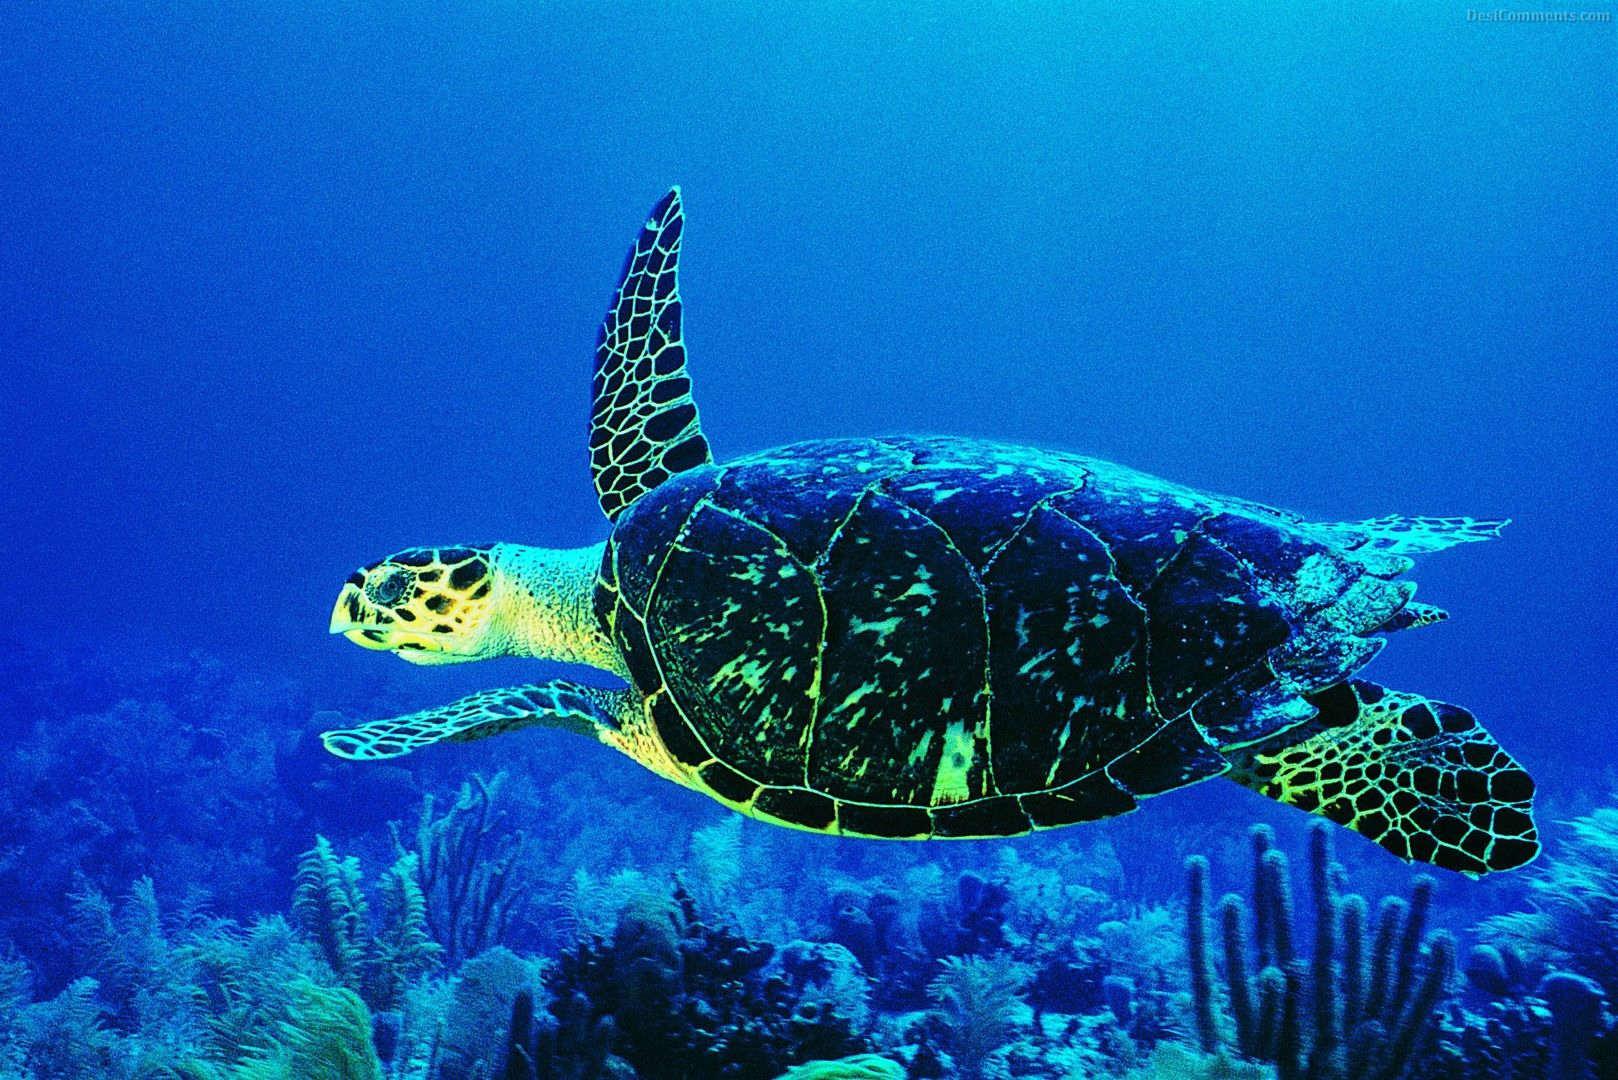 Life Underwater Wallpaper 51   DesiCommentscom 1618x1080